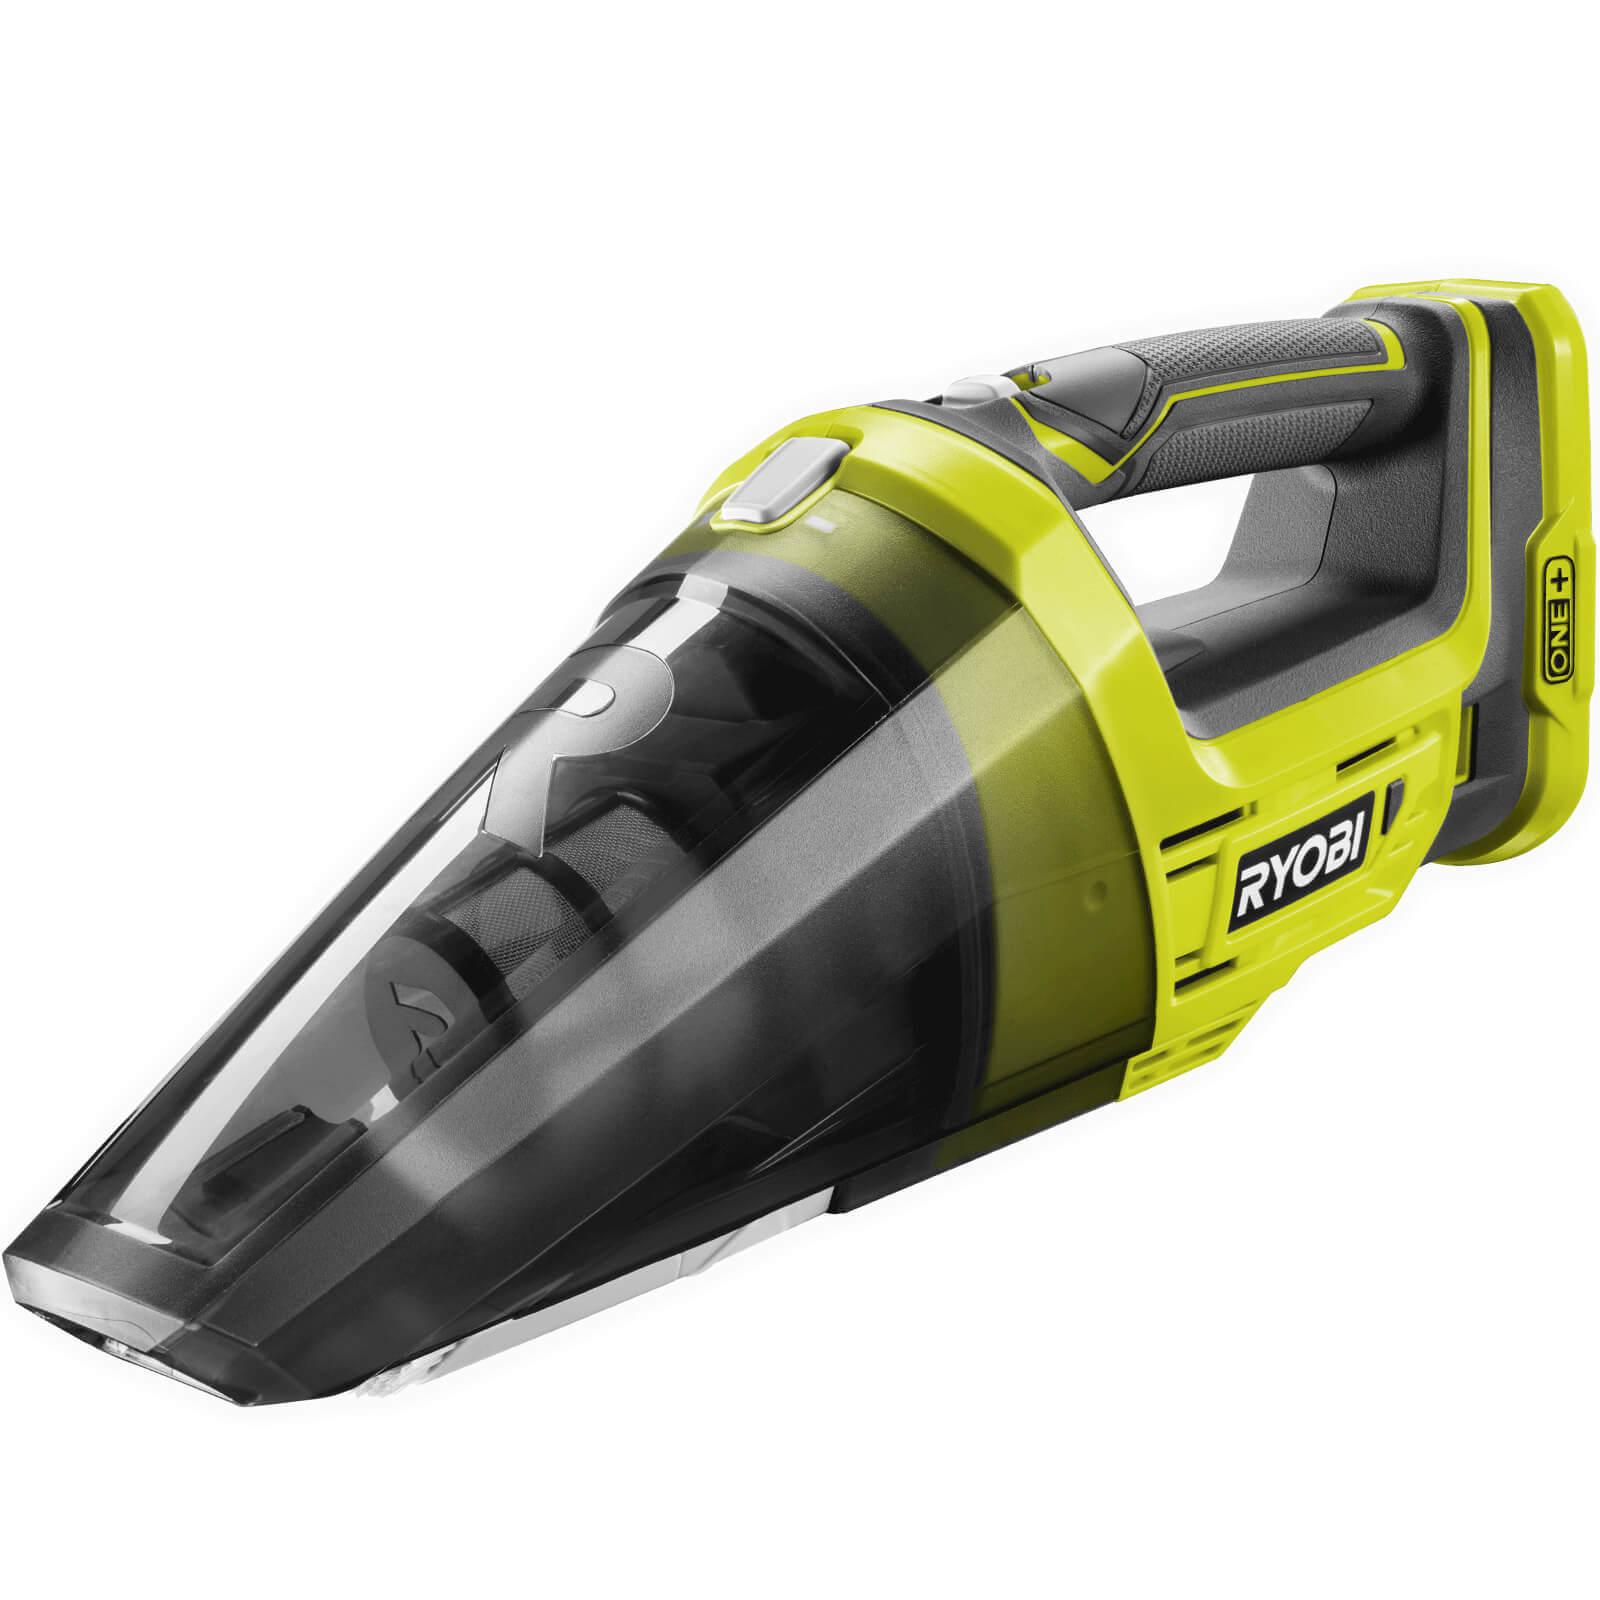 Ryobi R18hv One 18v Cordless Handheld Vacuum Cleaner